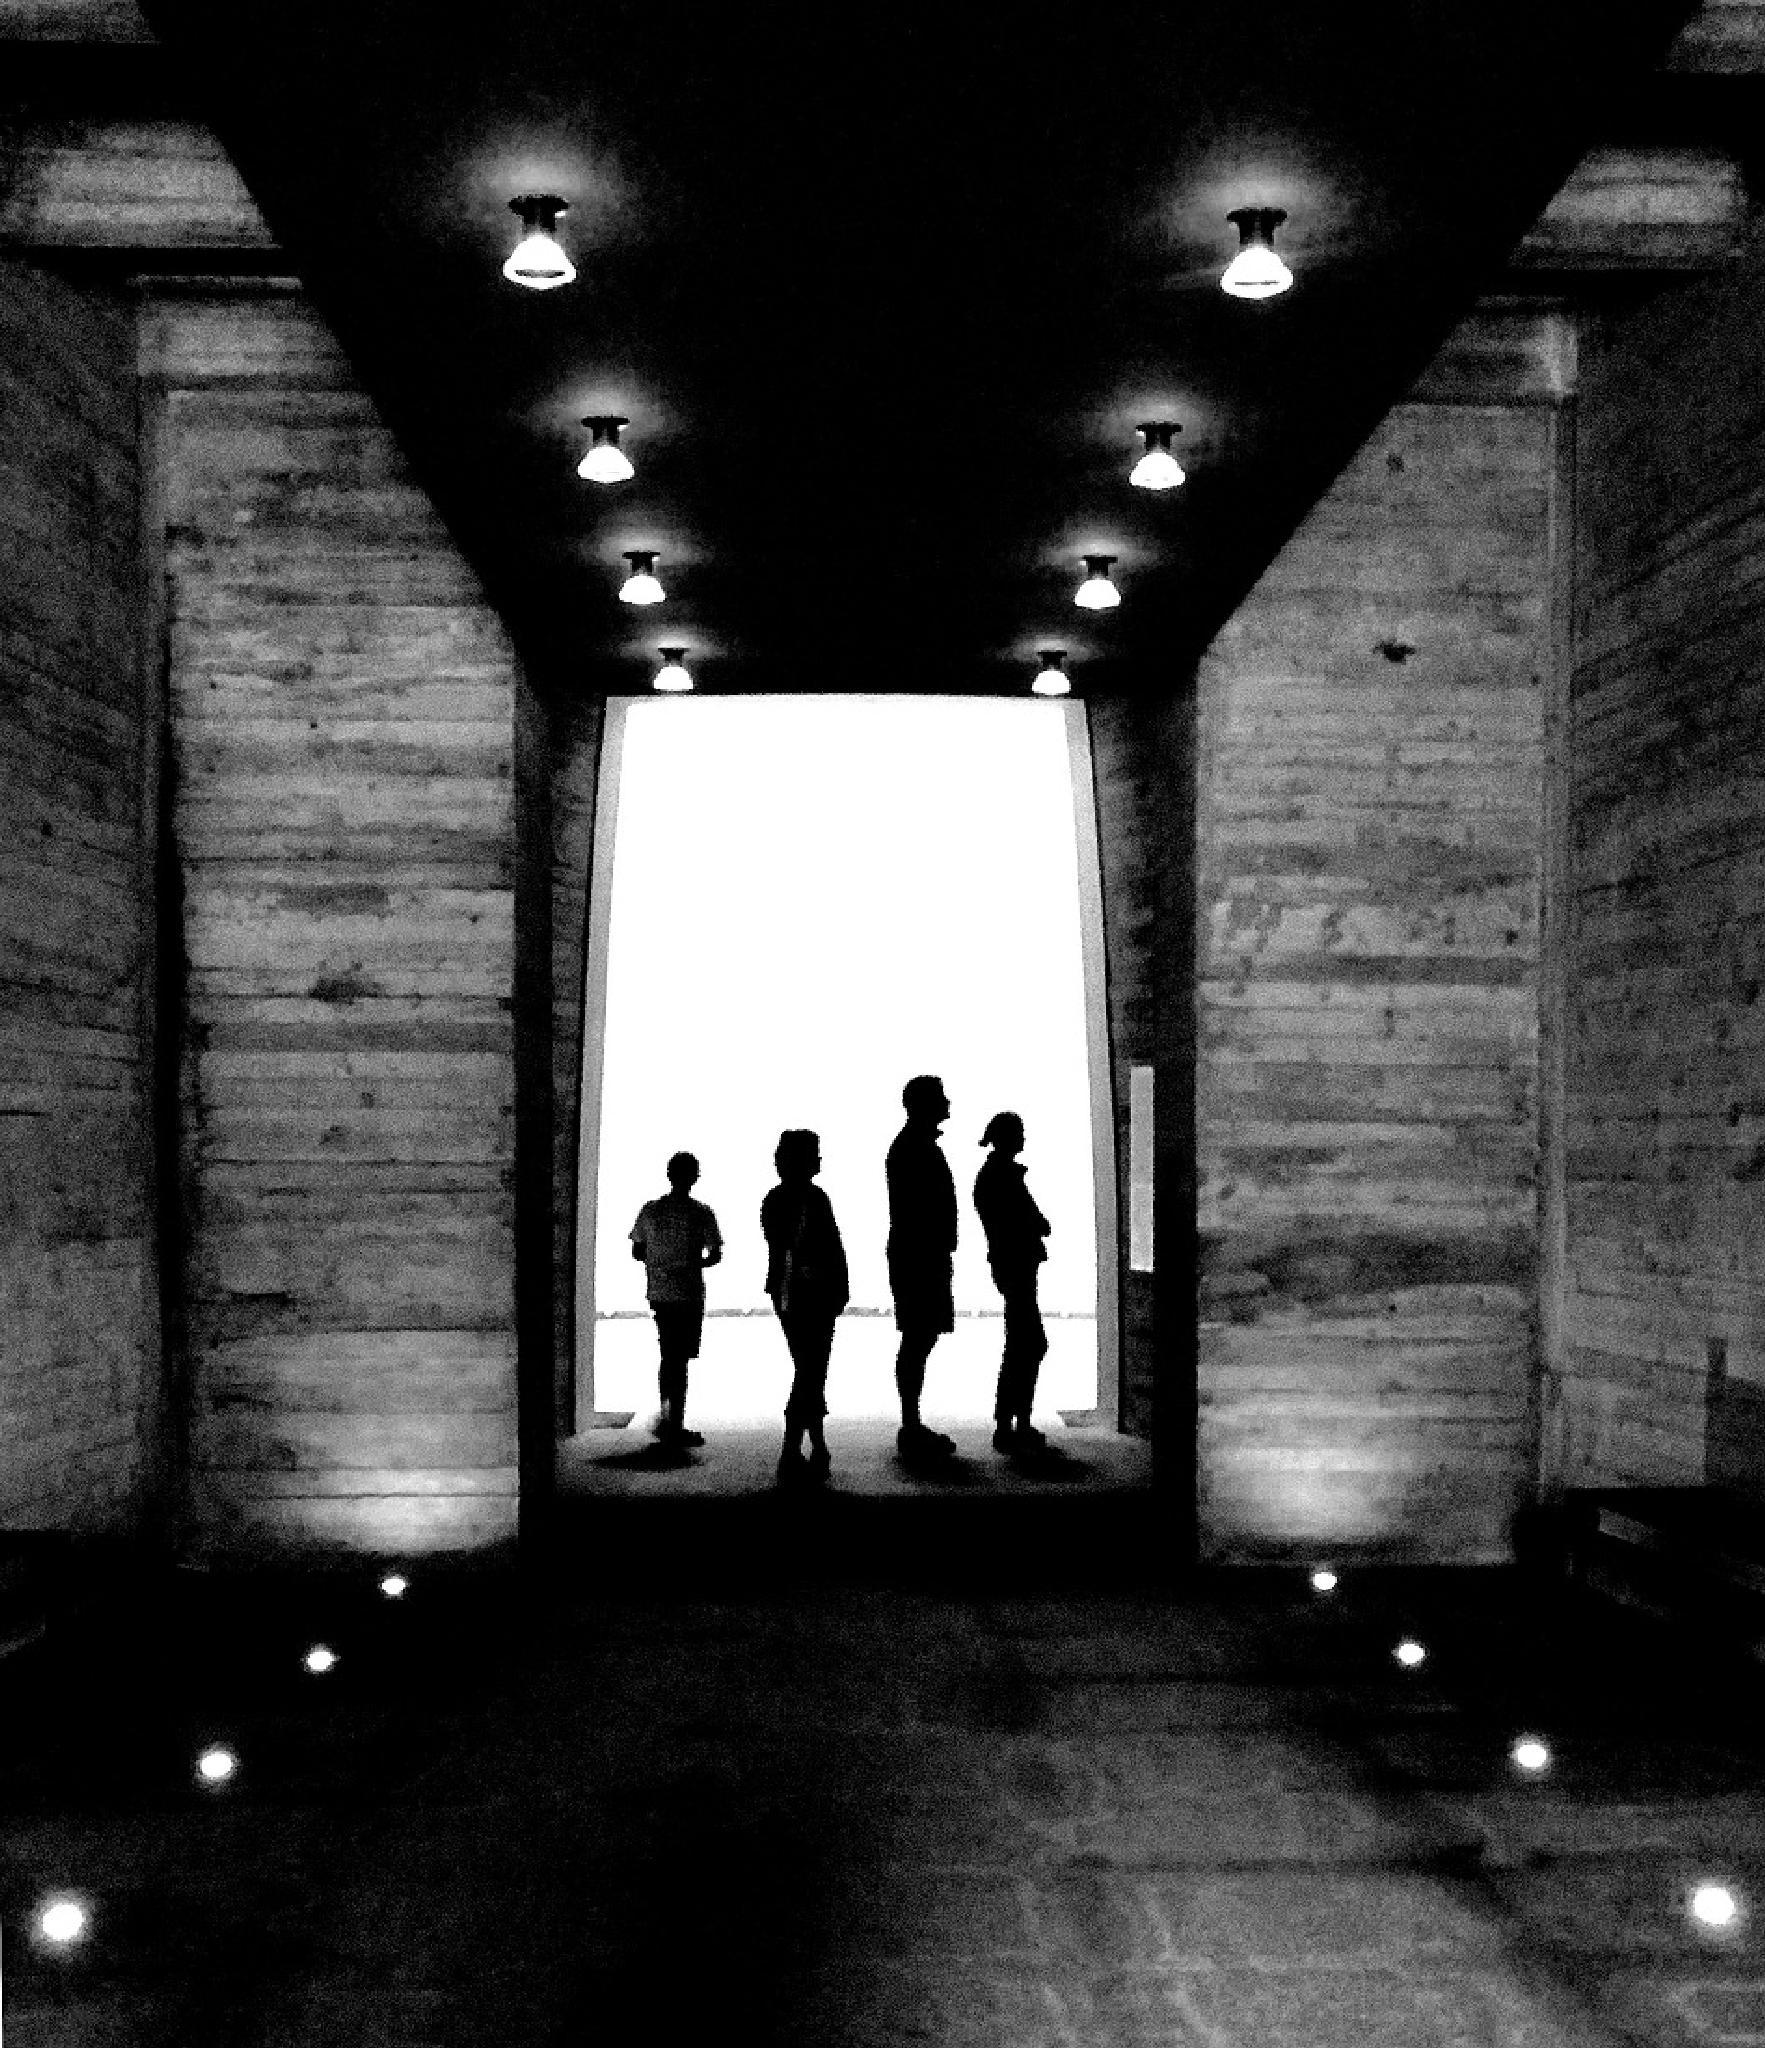 -silhouettes/IIII- by rytis.vilnietis